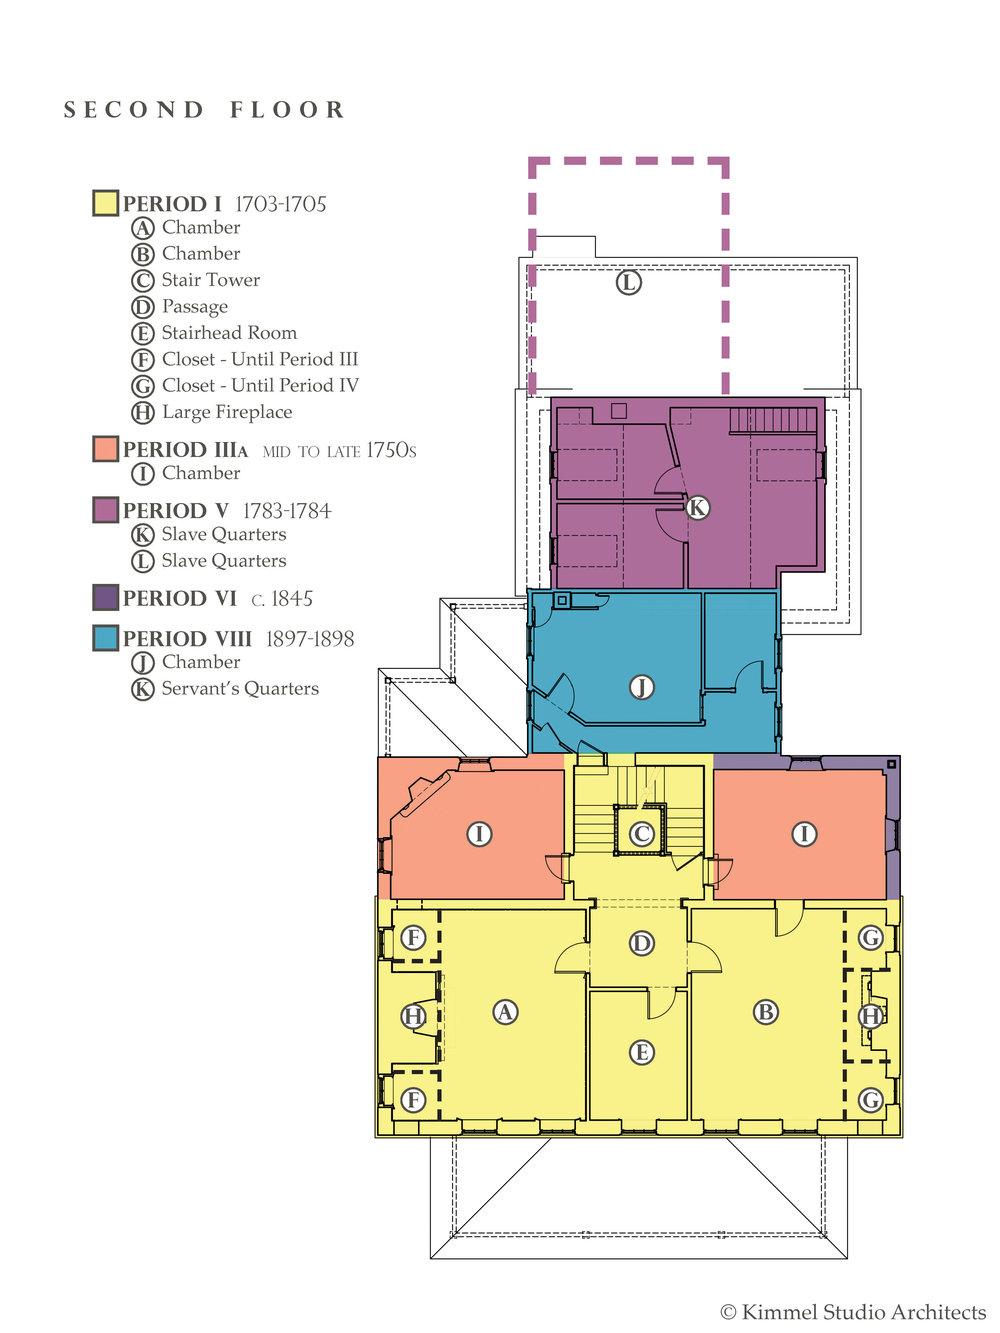 Kimmel Studio - Cloverfields Second Floor Plan.jpg